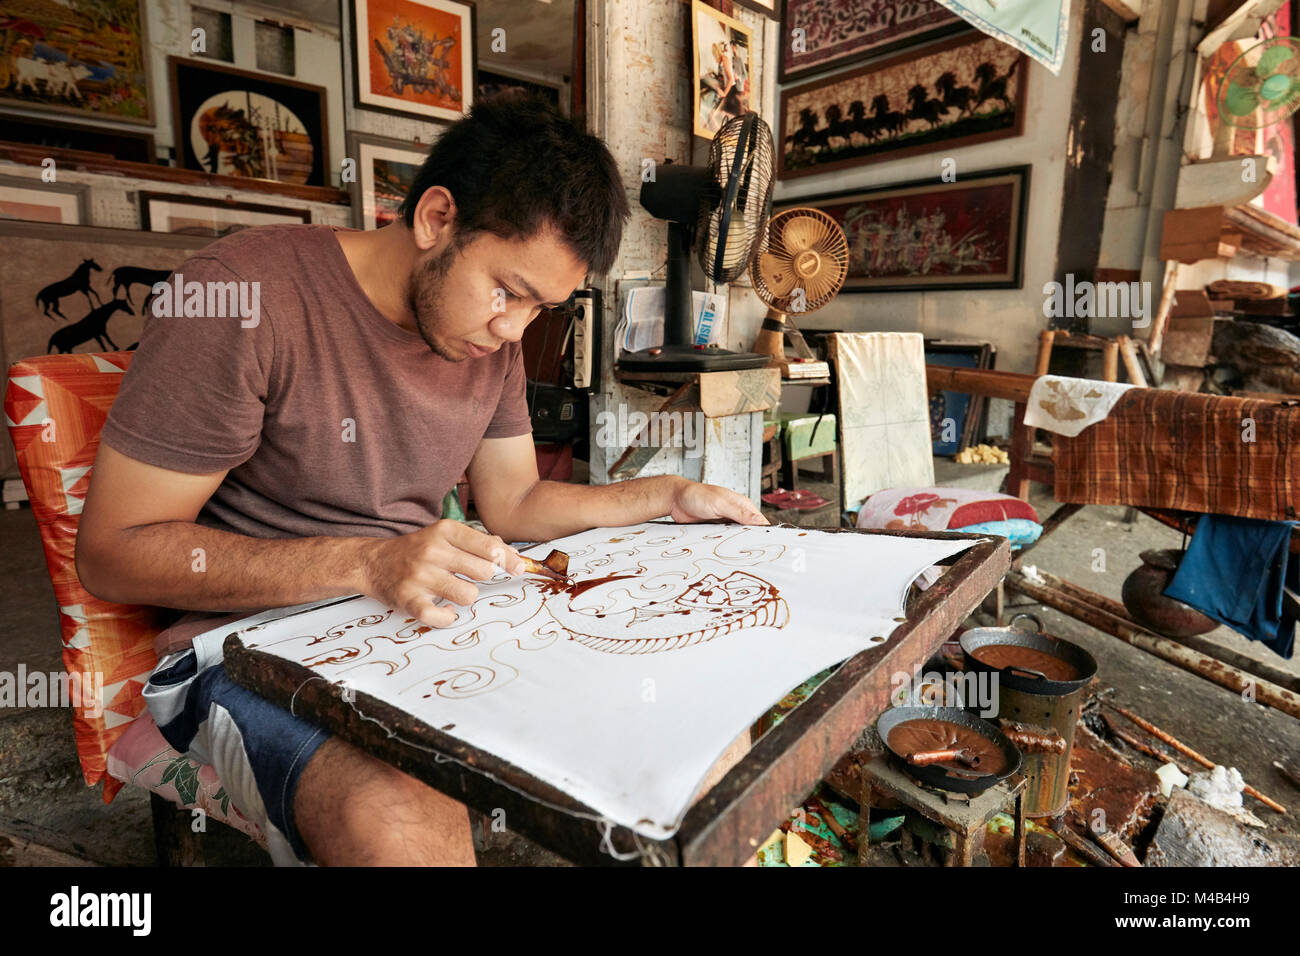 La pintura batik artesanal con un canting (spouted útil) en el batik Seno shop. Yogyakarta, Java, Indonesia. Imagen De Stock